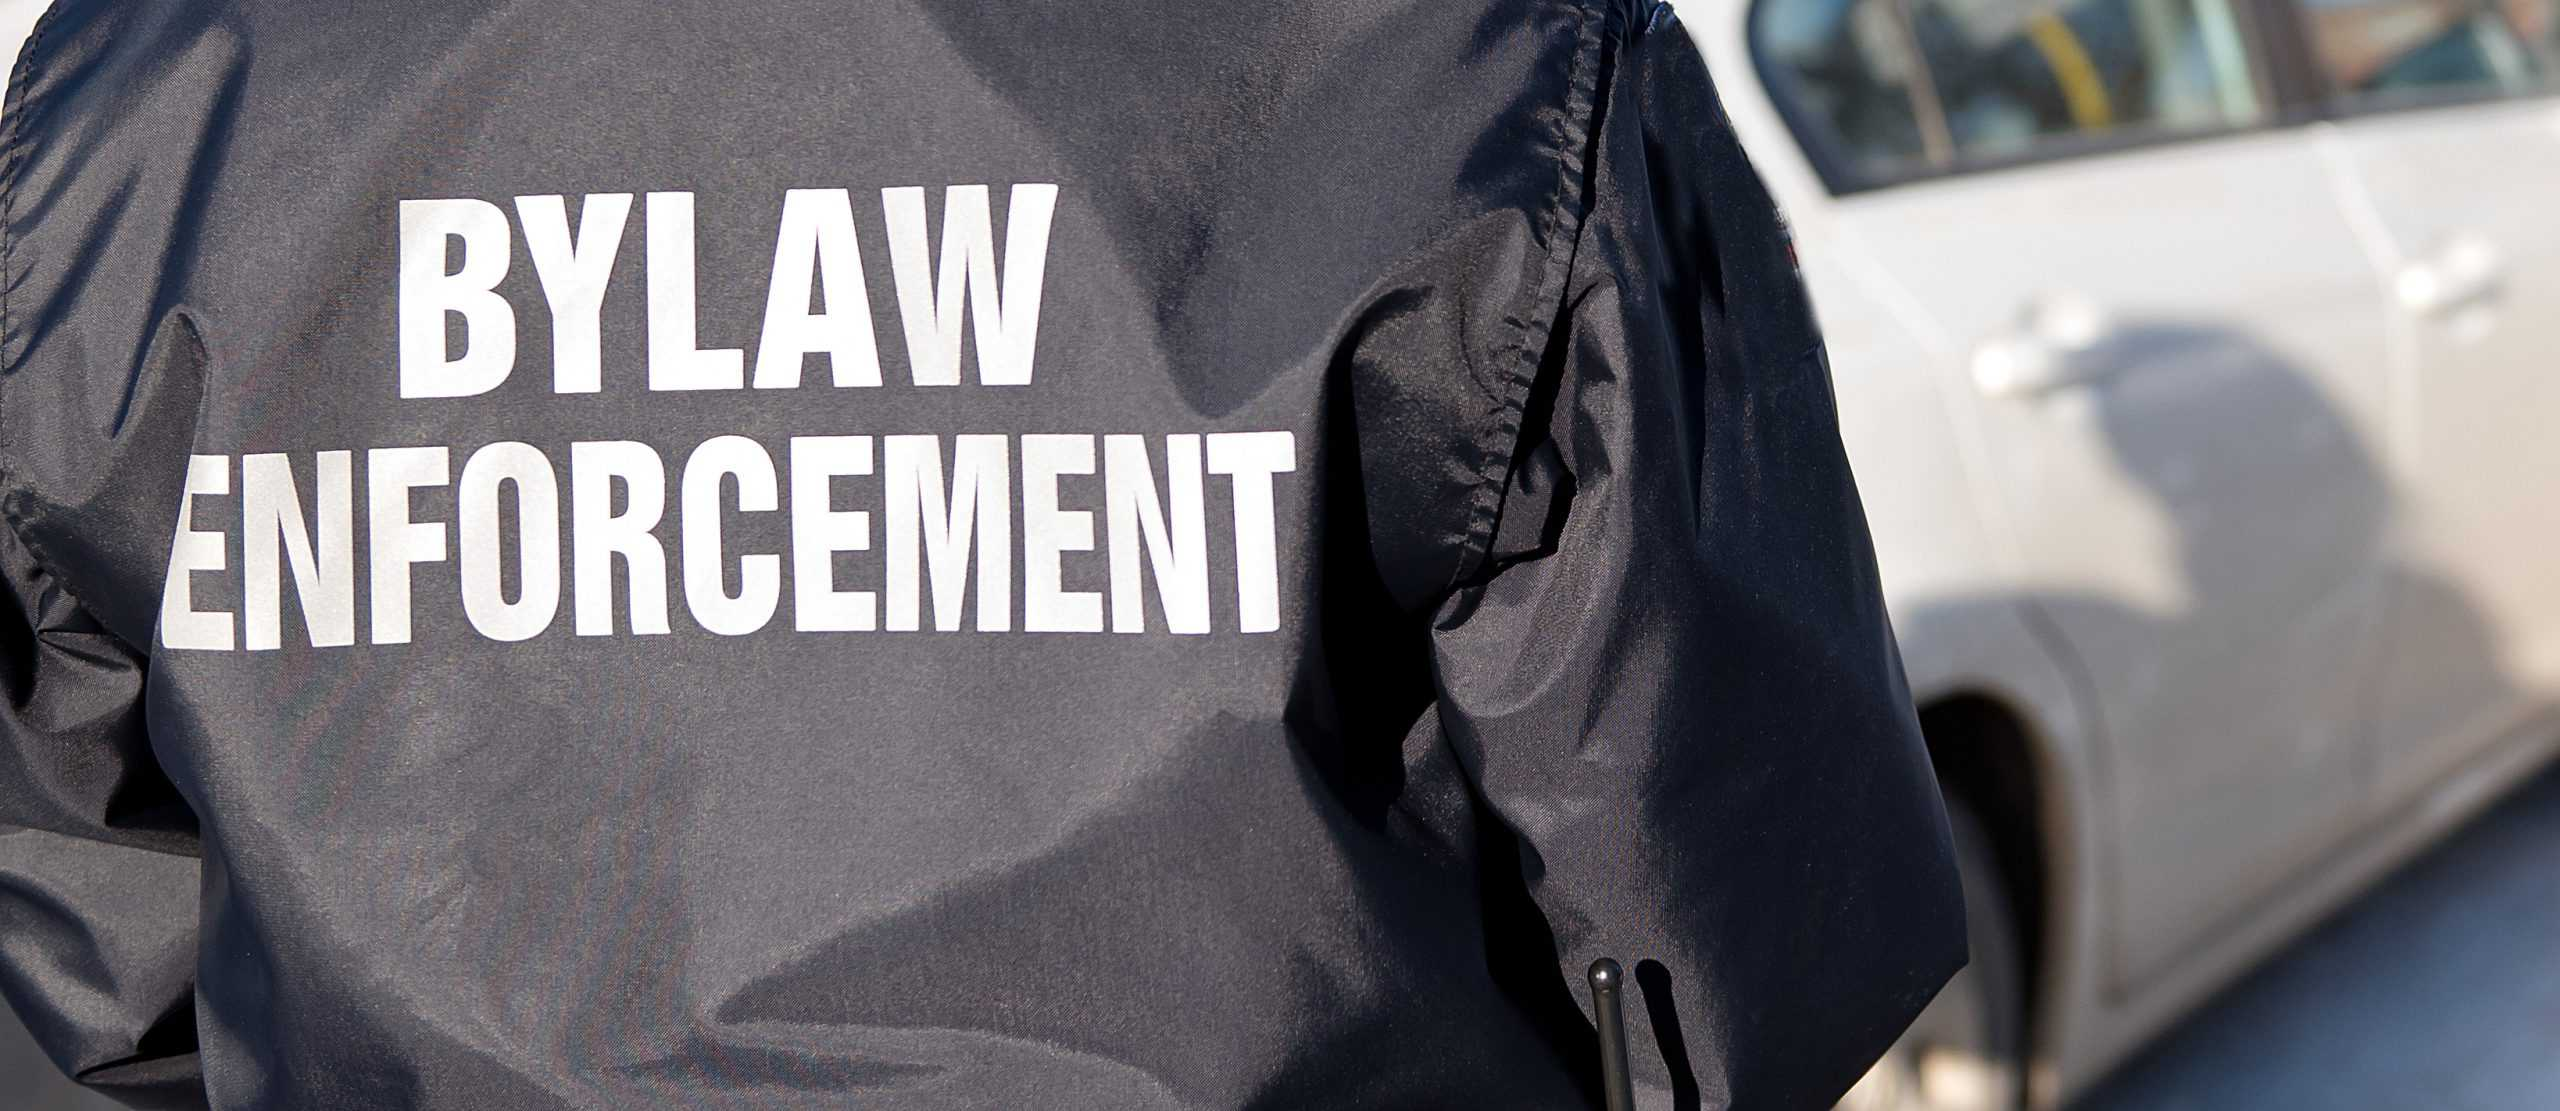 bylaw_enforcement